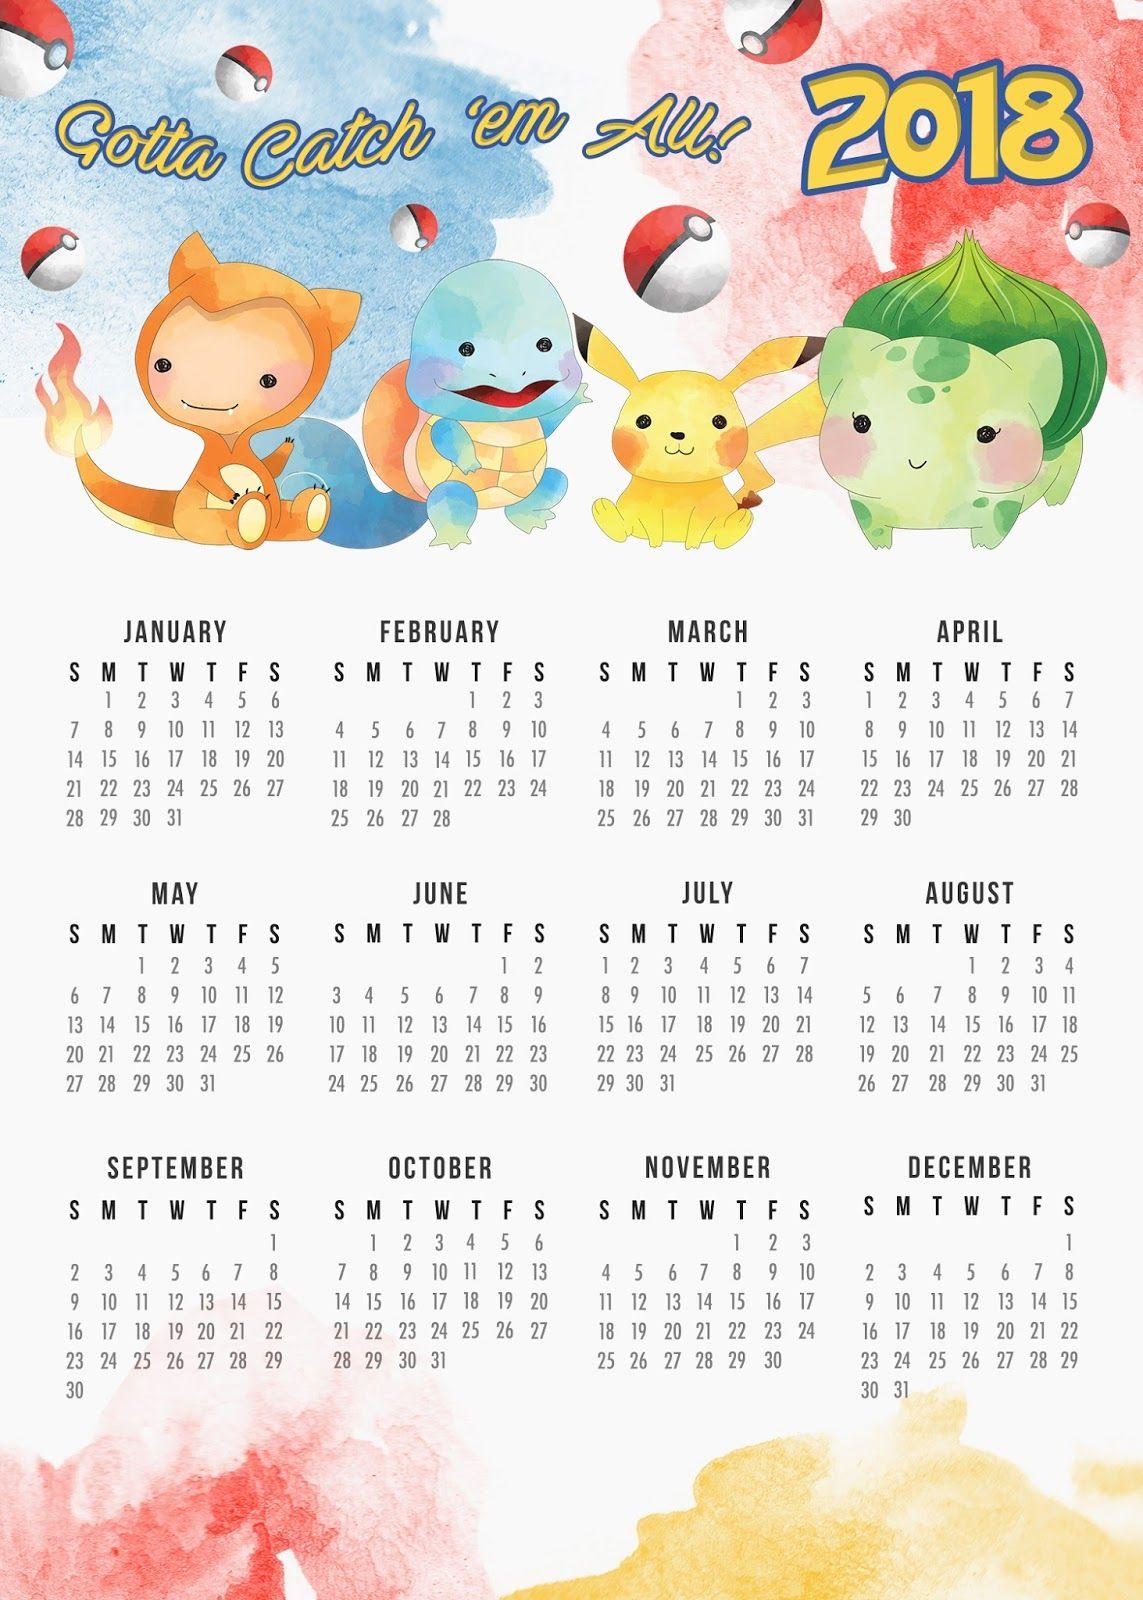 Pikachu December 2019 Calendar 2018 12 Months Pokemon Printable Calendar | 2018 Calendars